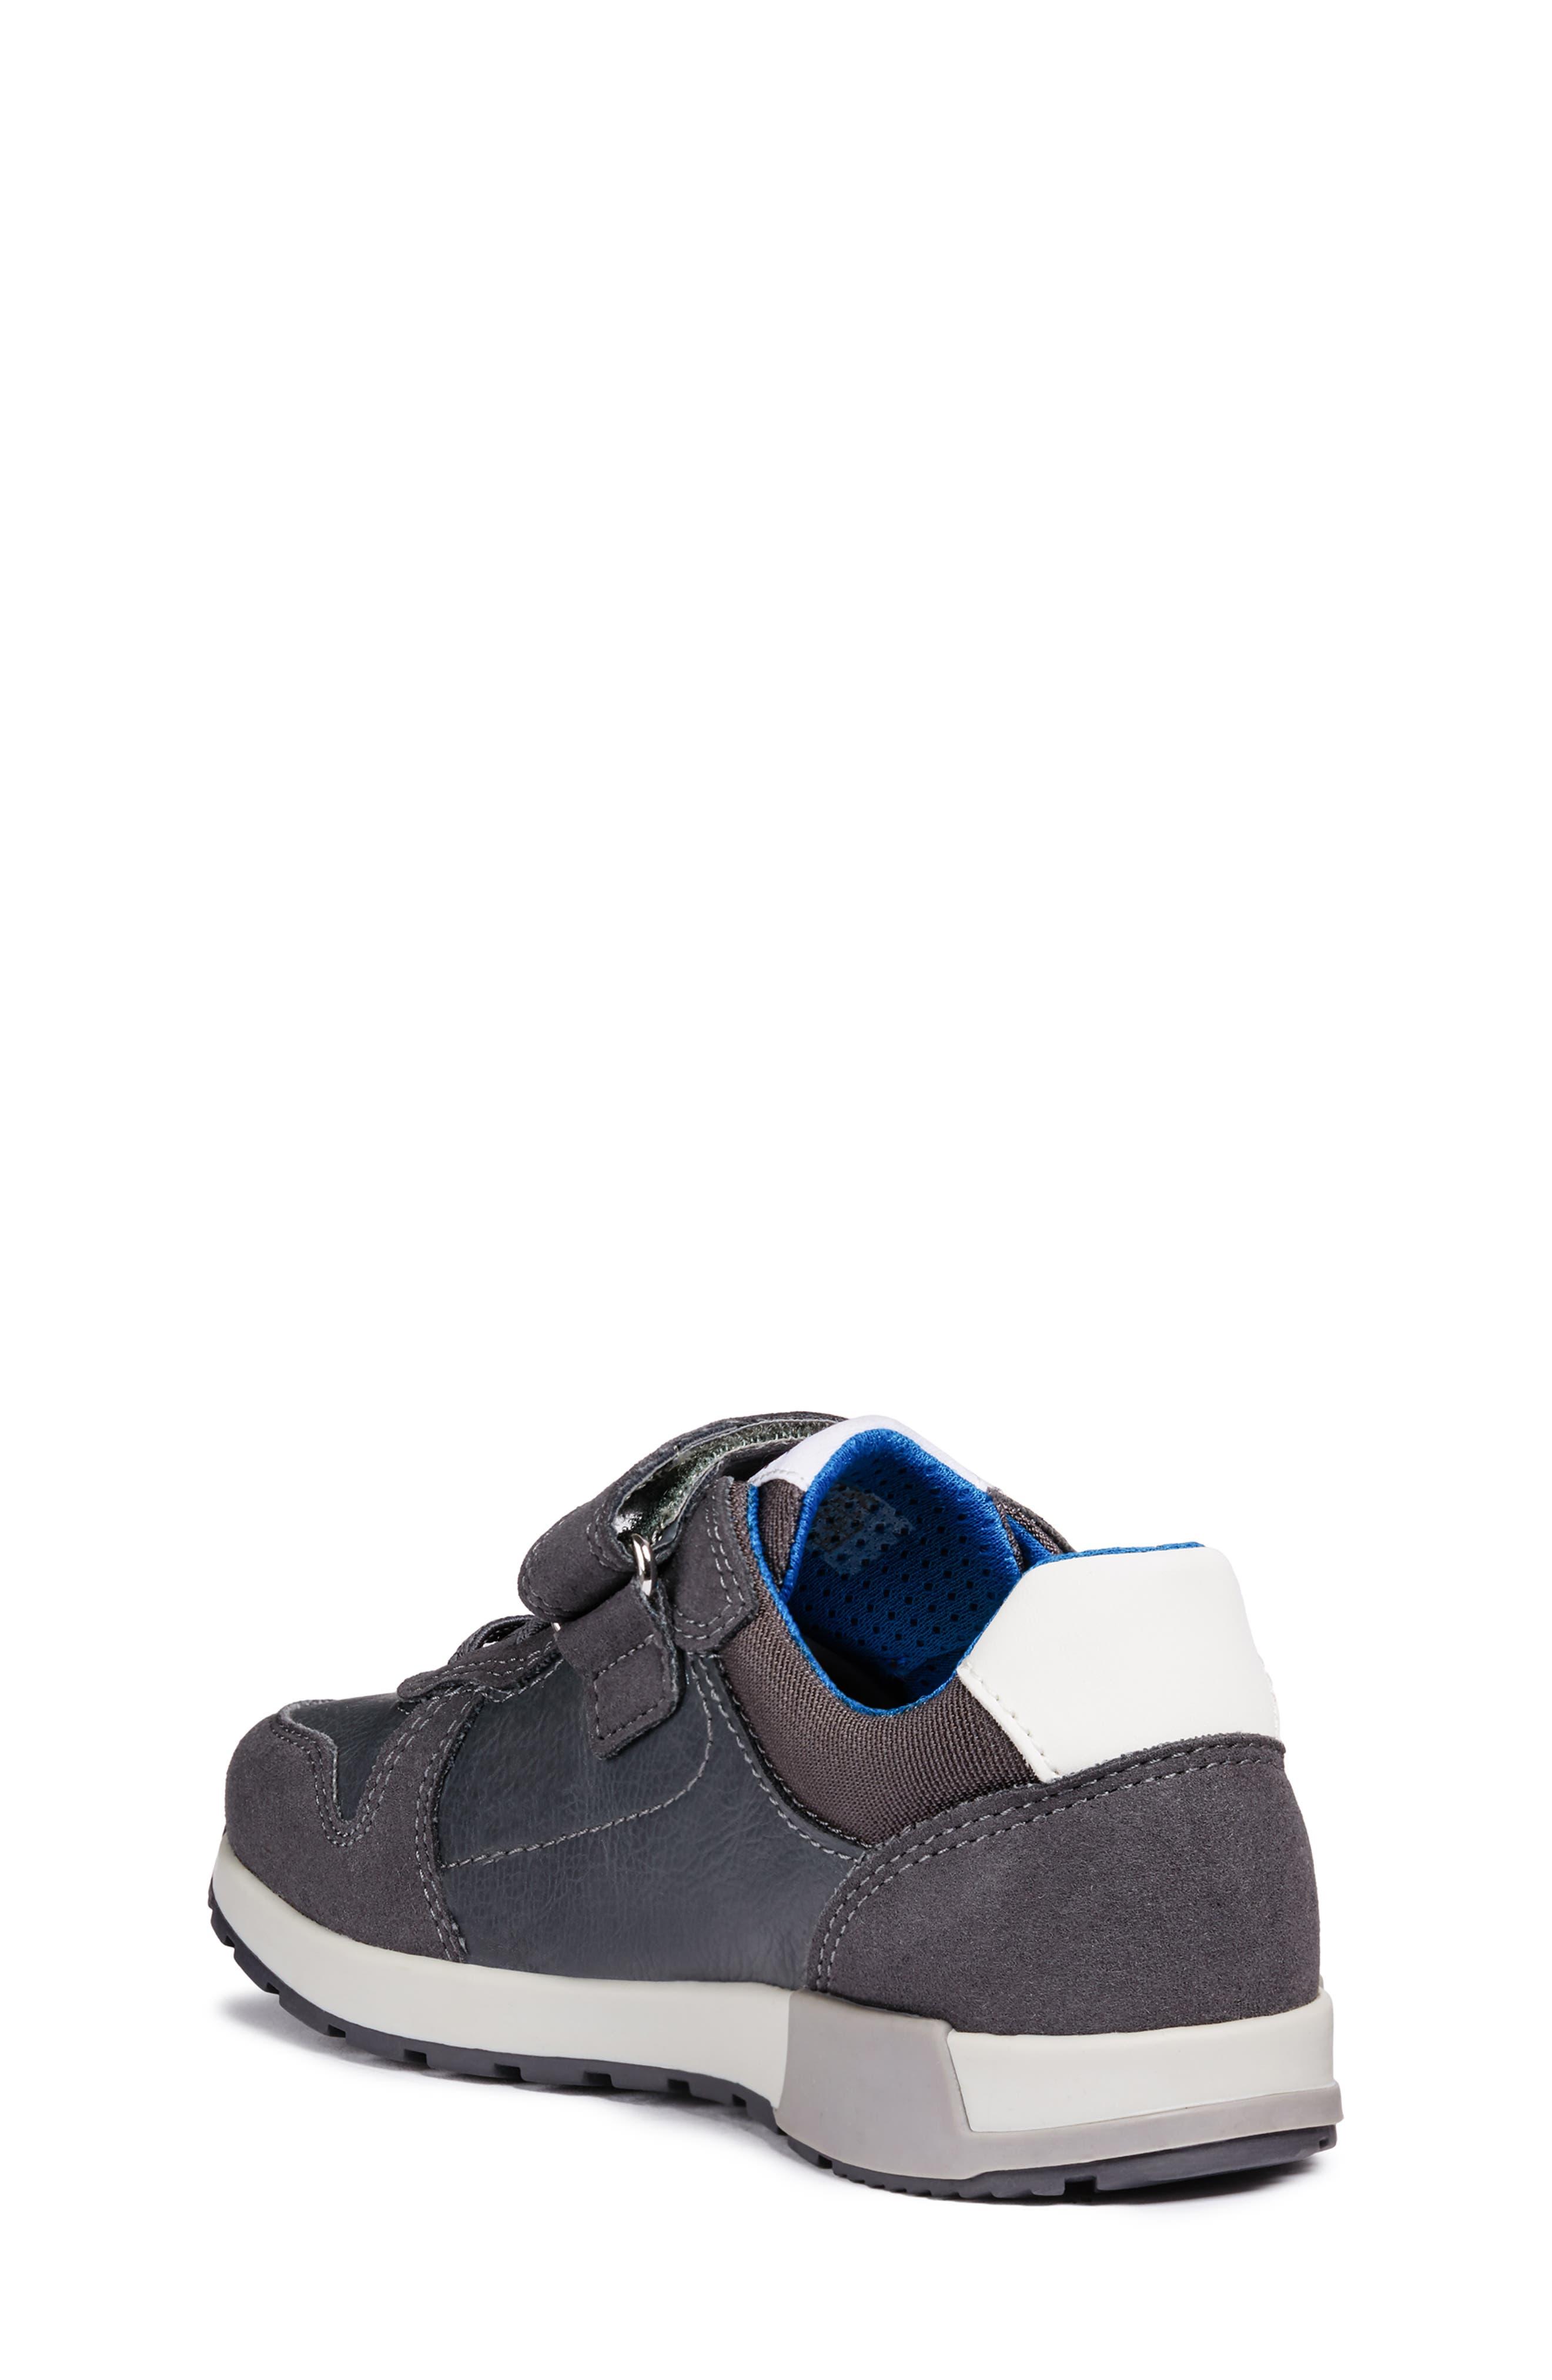 Alfier Boy Sneaker,                             Alternate thumbnail 2, color,                             DARK GREY/GREY